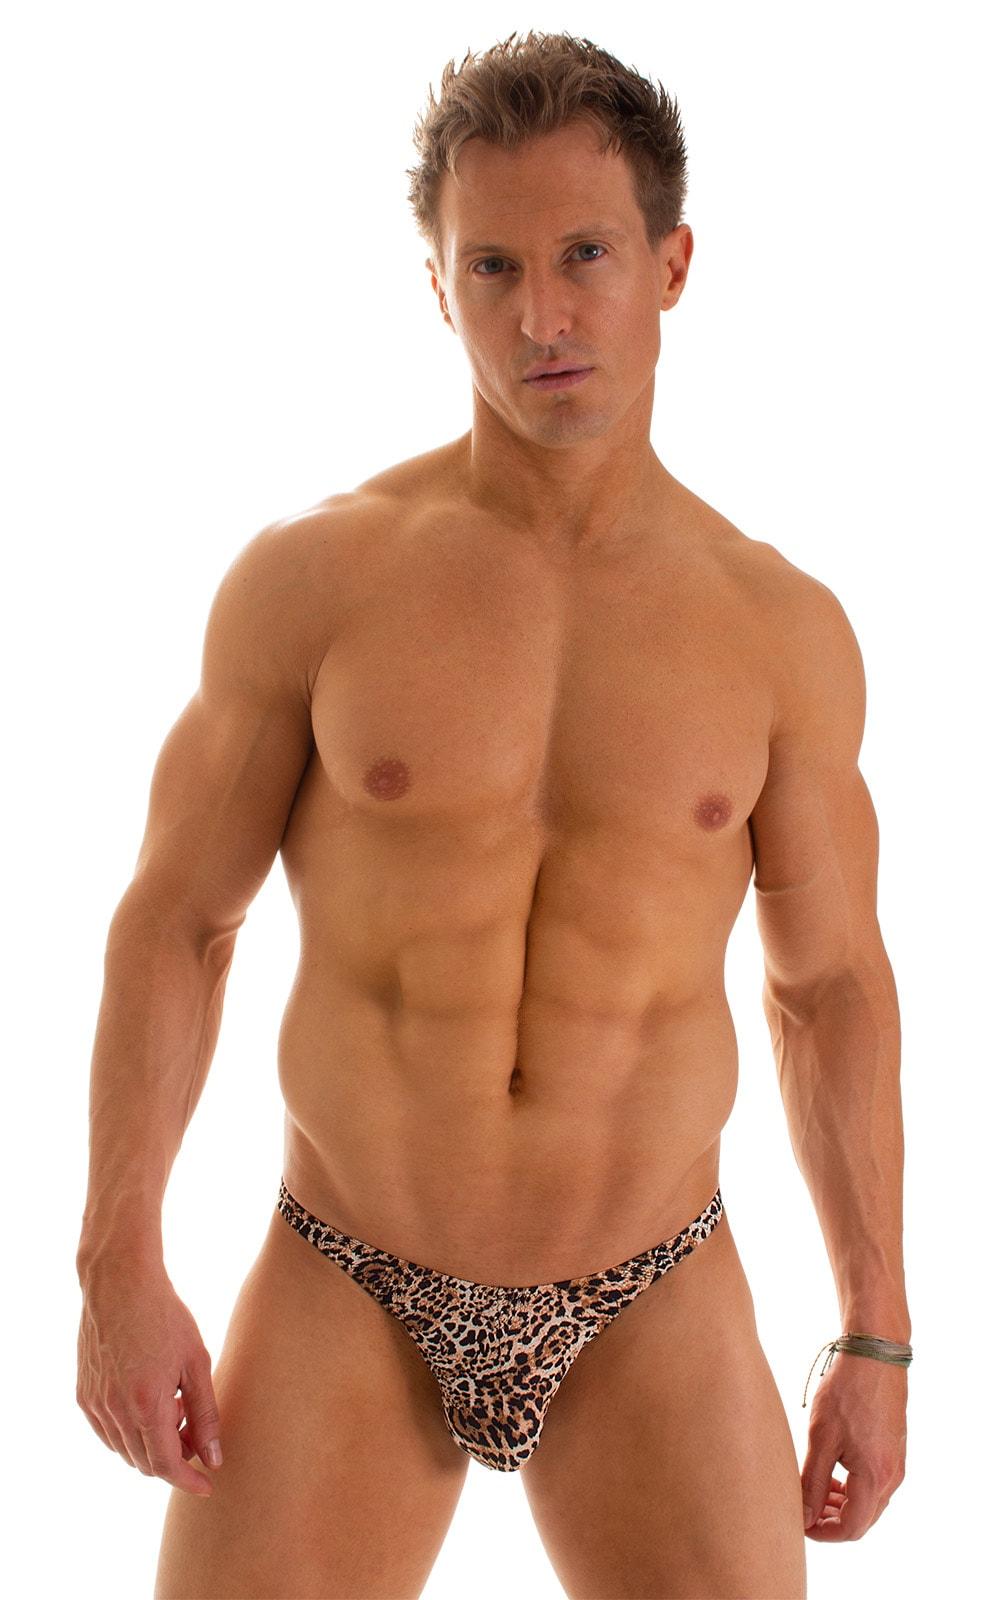 Fitted Bikini Bathing Suit in Super ThinSKINZ Cheeta 1